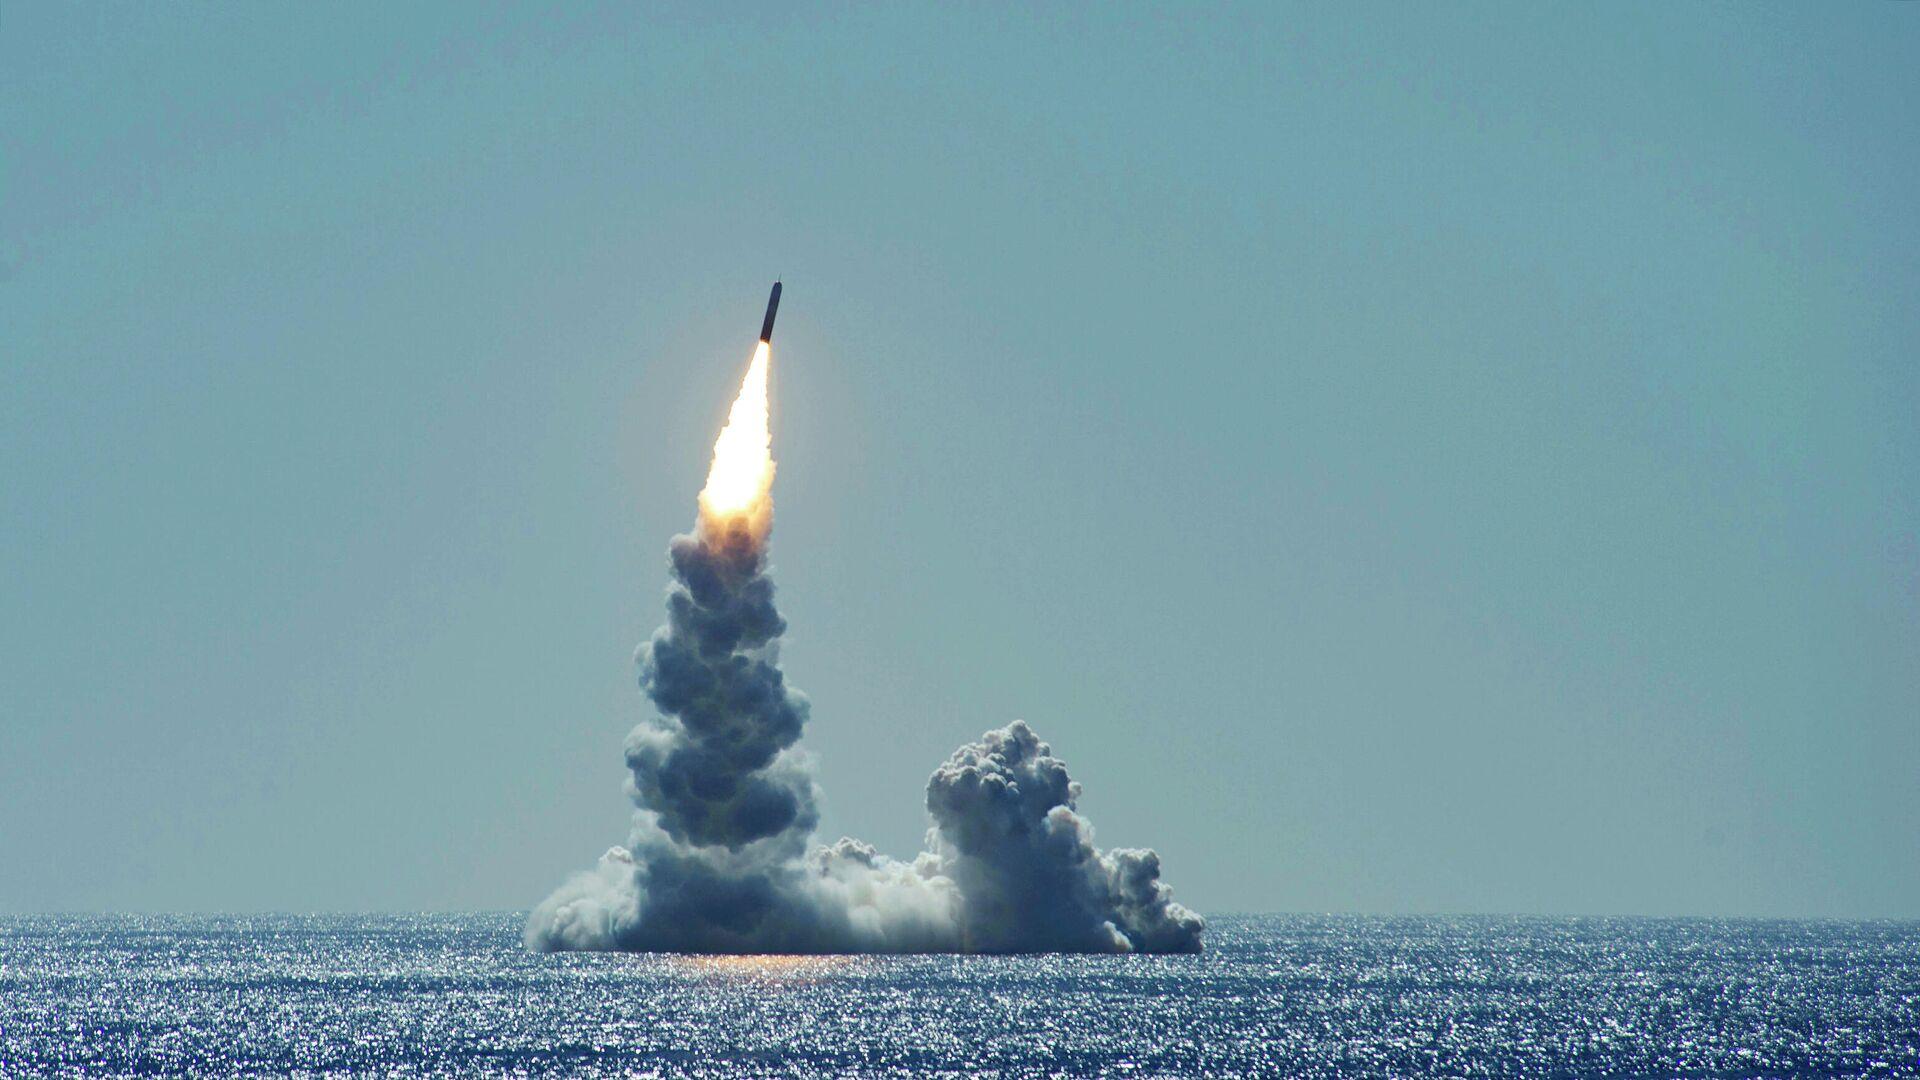 Запуск баллистической ракеты Trident II (D5LE) с подводной лодки USS Maine - РИА Новости, 1920, 03.09.2020